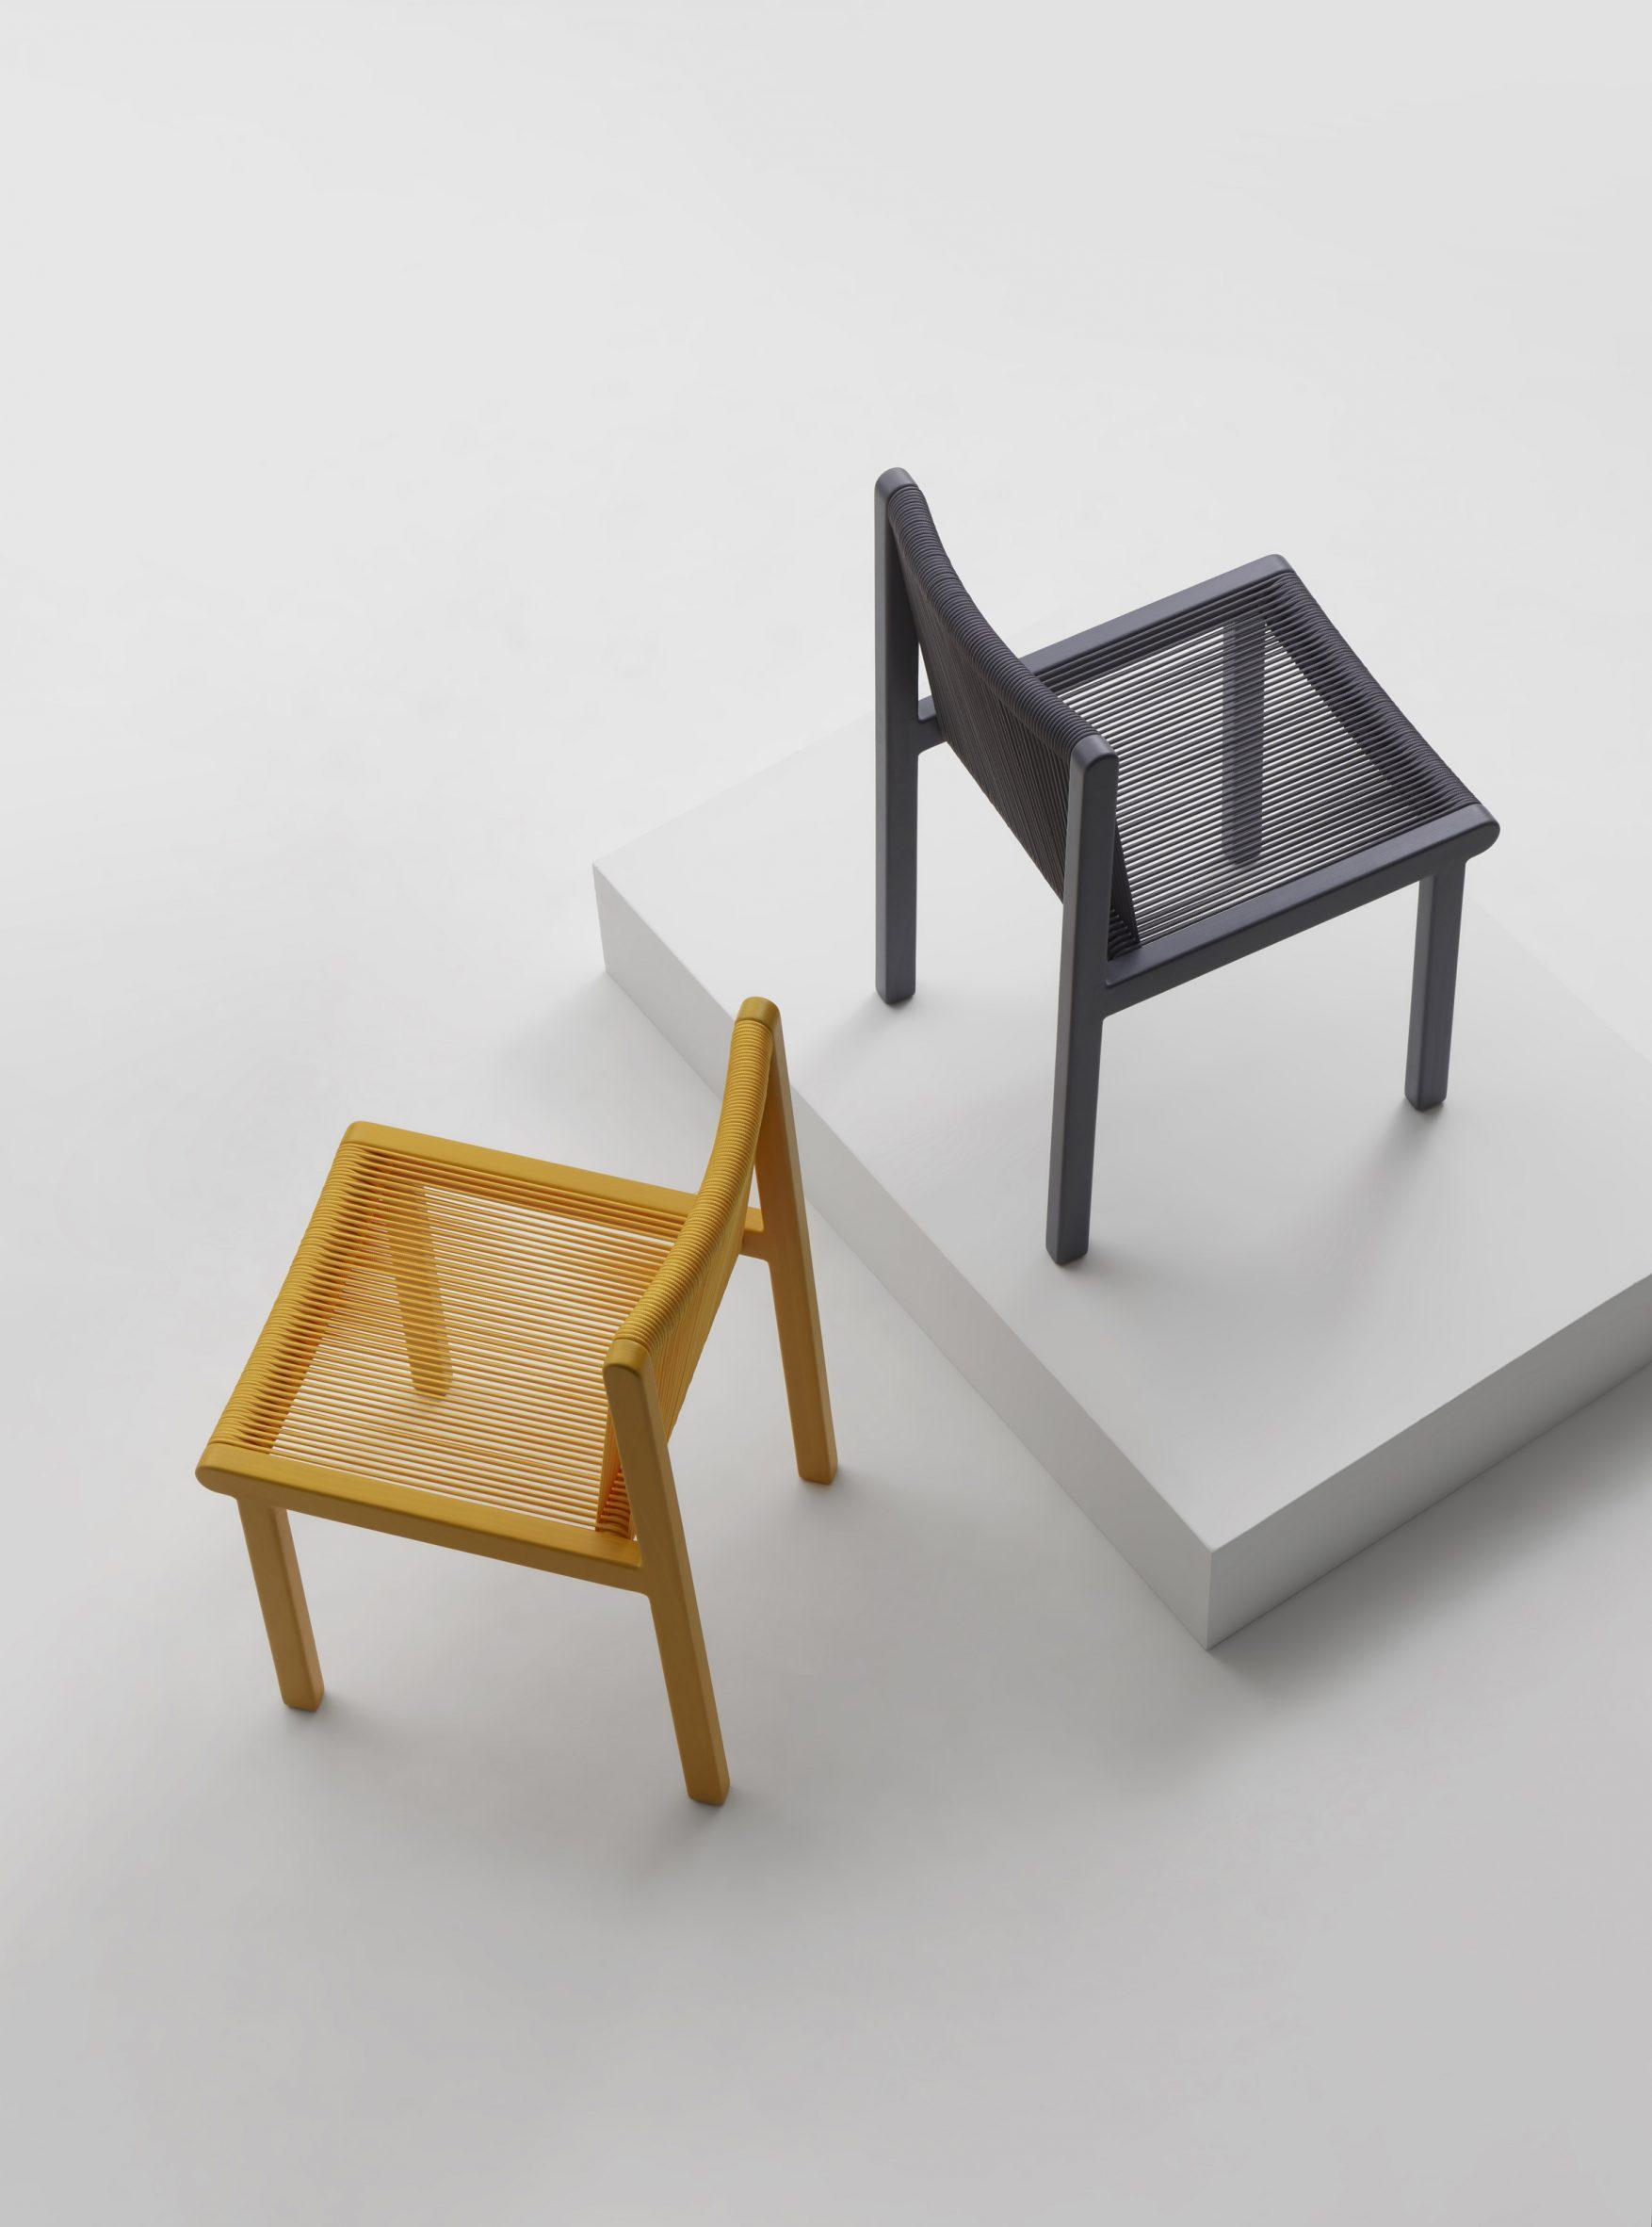 Filo chair by Ronan and Erwan Bouroullec for Mattiazzi